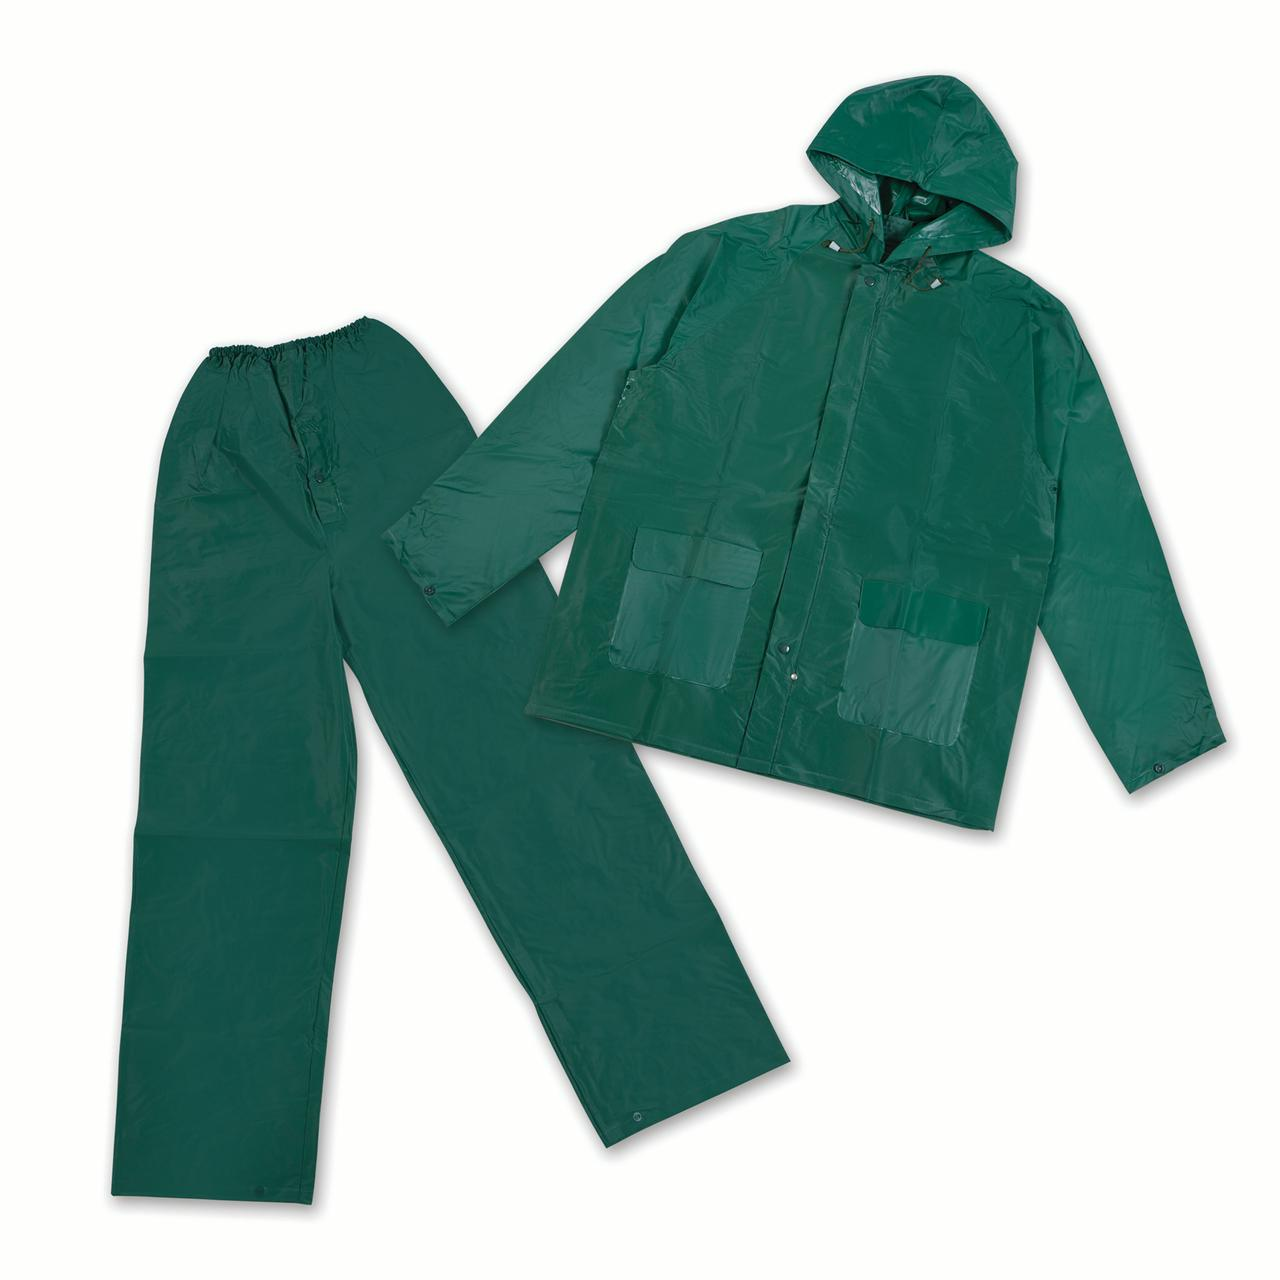 Stansport PVC Rainsuit PVC Back Green 2XL by Stansport